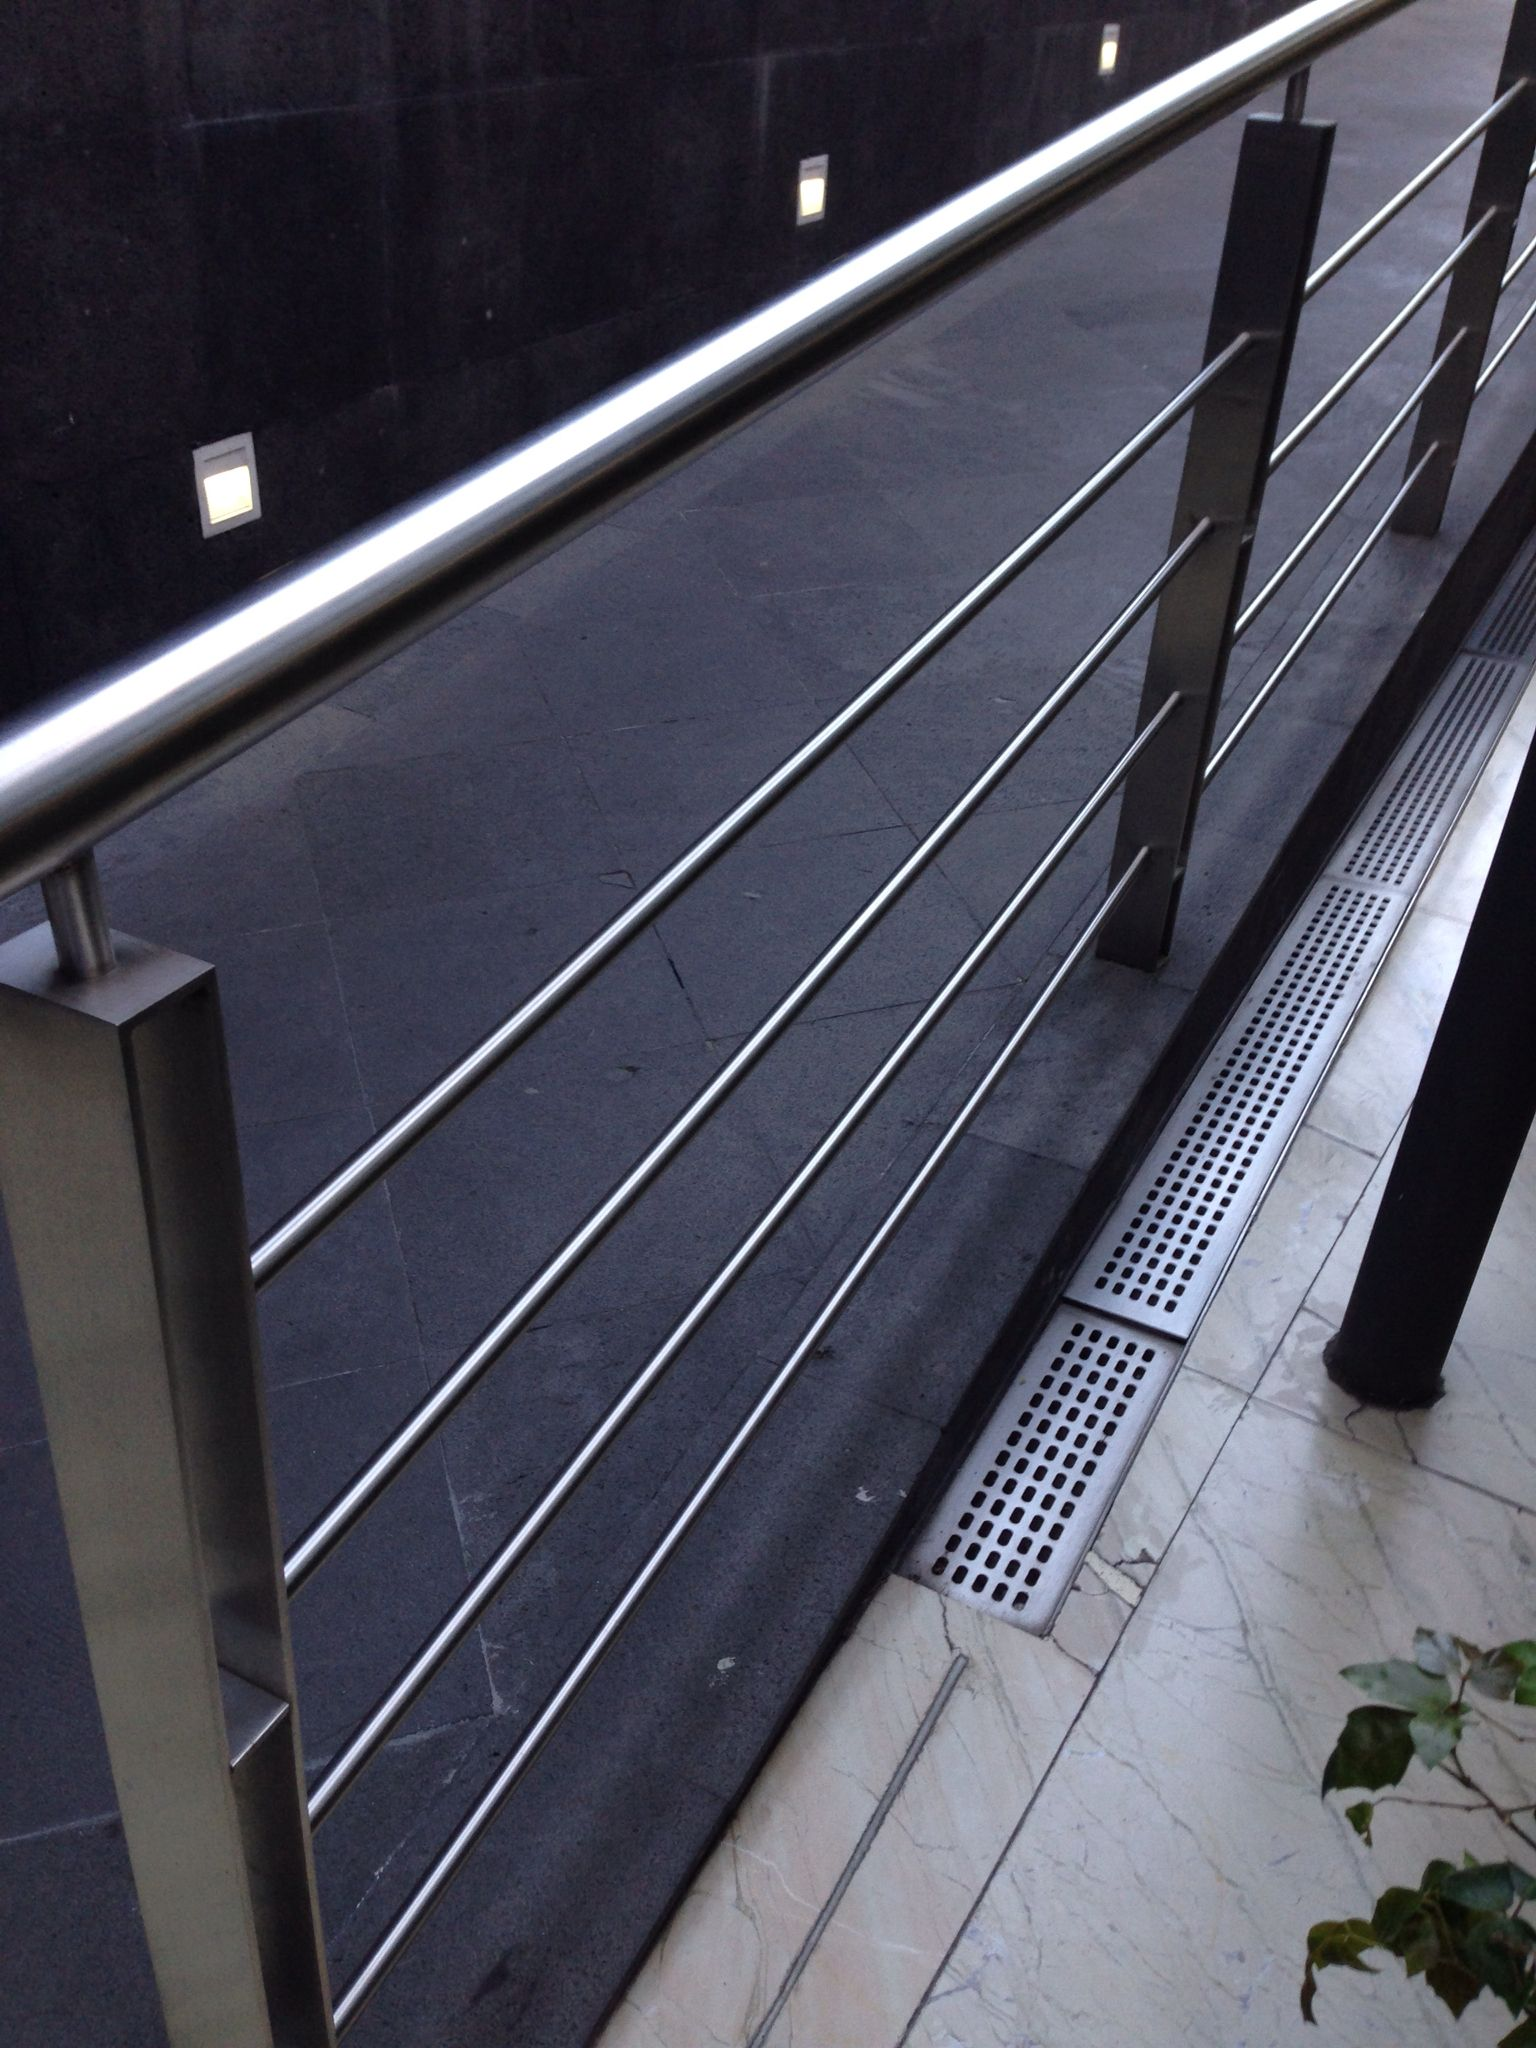 Barandales de acero para exteriores escaleras y barandal - Barandales modernos para escaleras ...